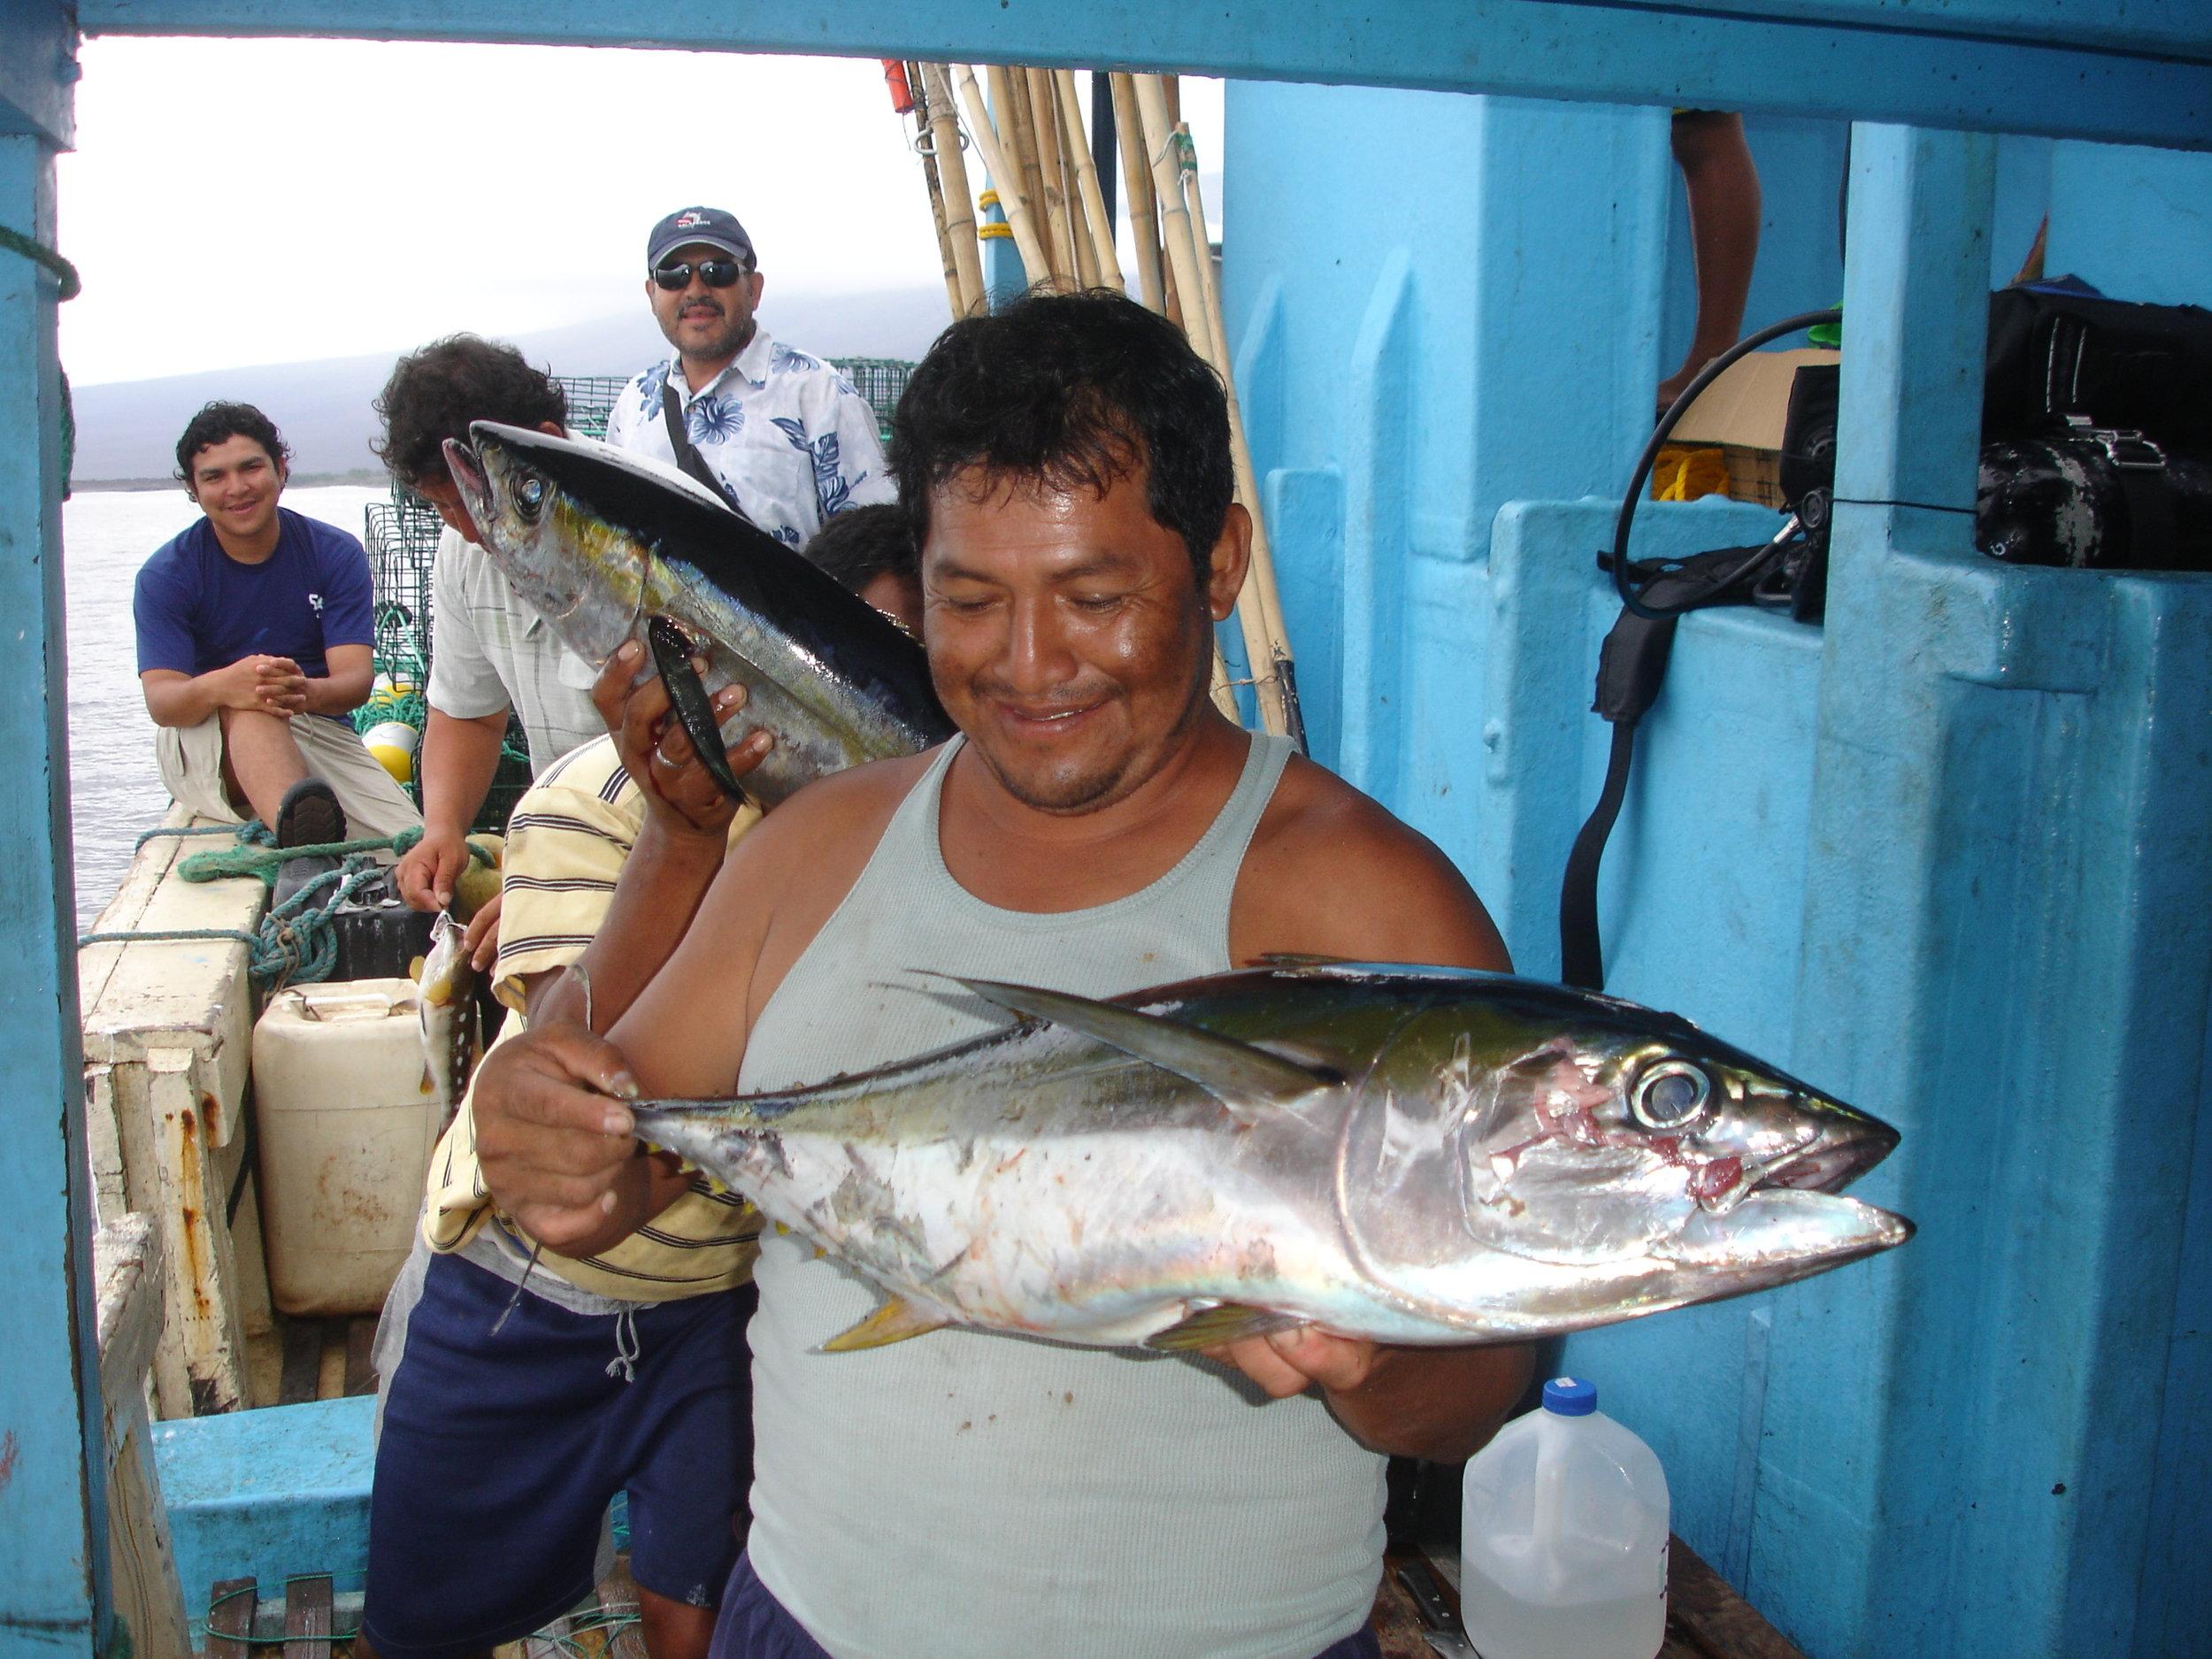 Figure 1.  A Galapagos artisanal fisherman holding a yellowfin tuna. Photo: Mauricio Castrejón